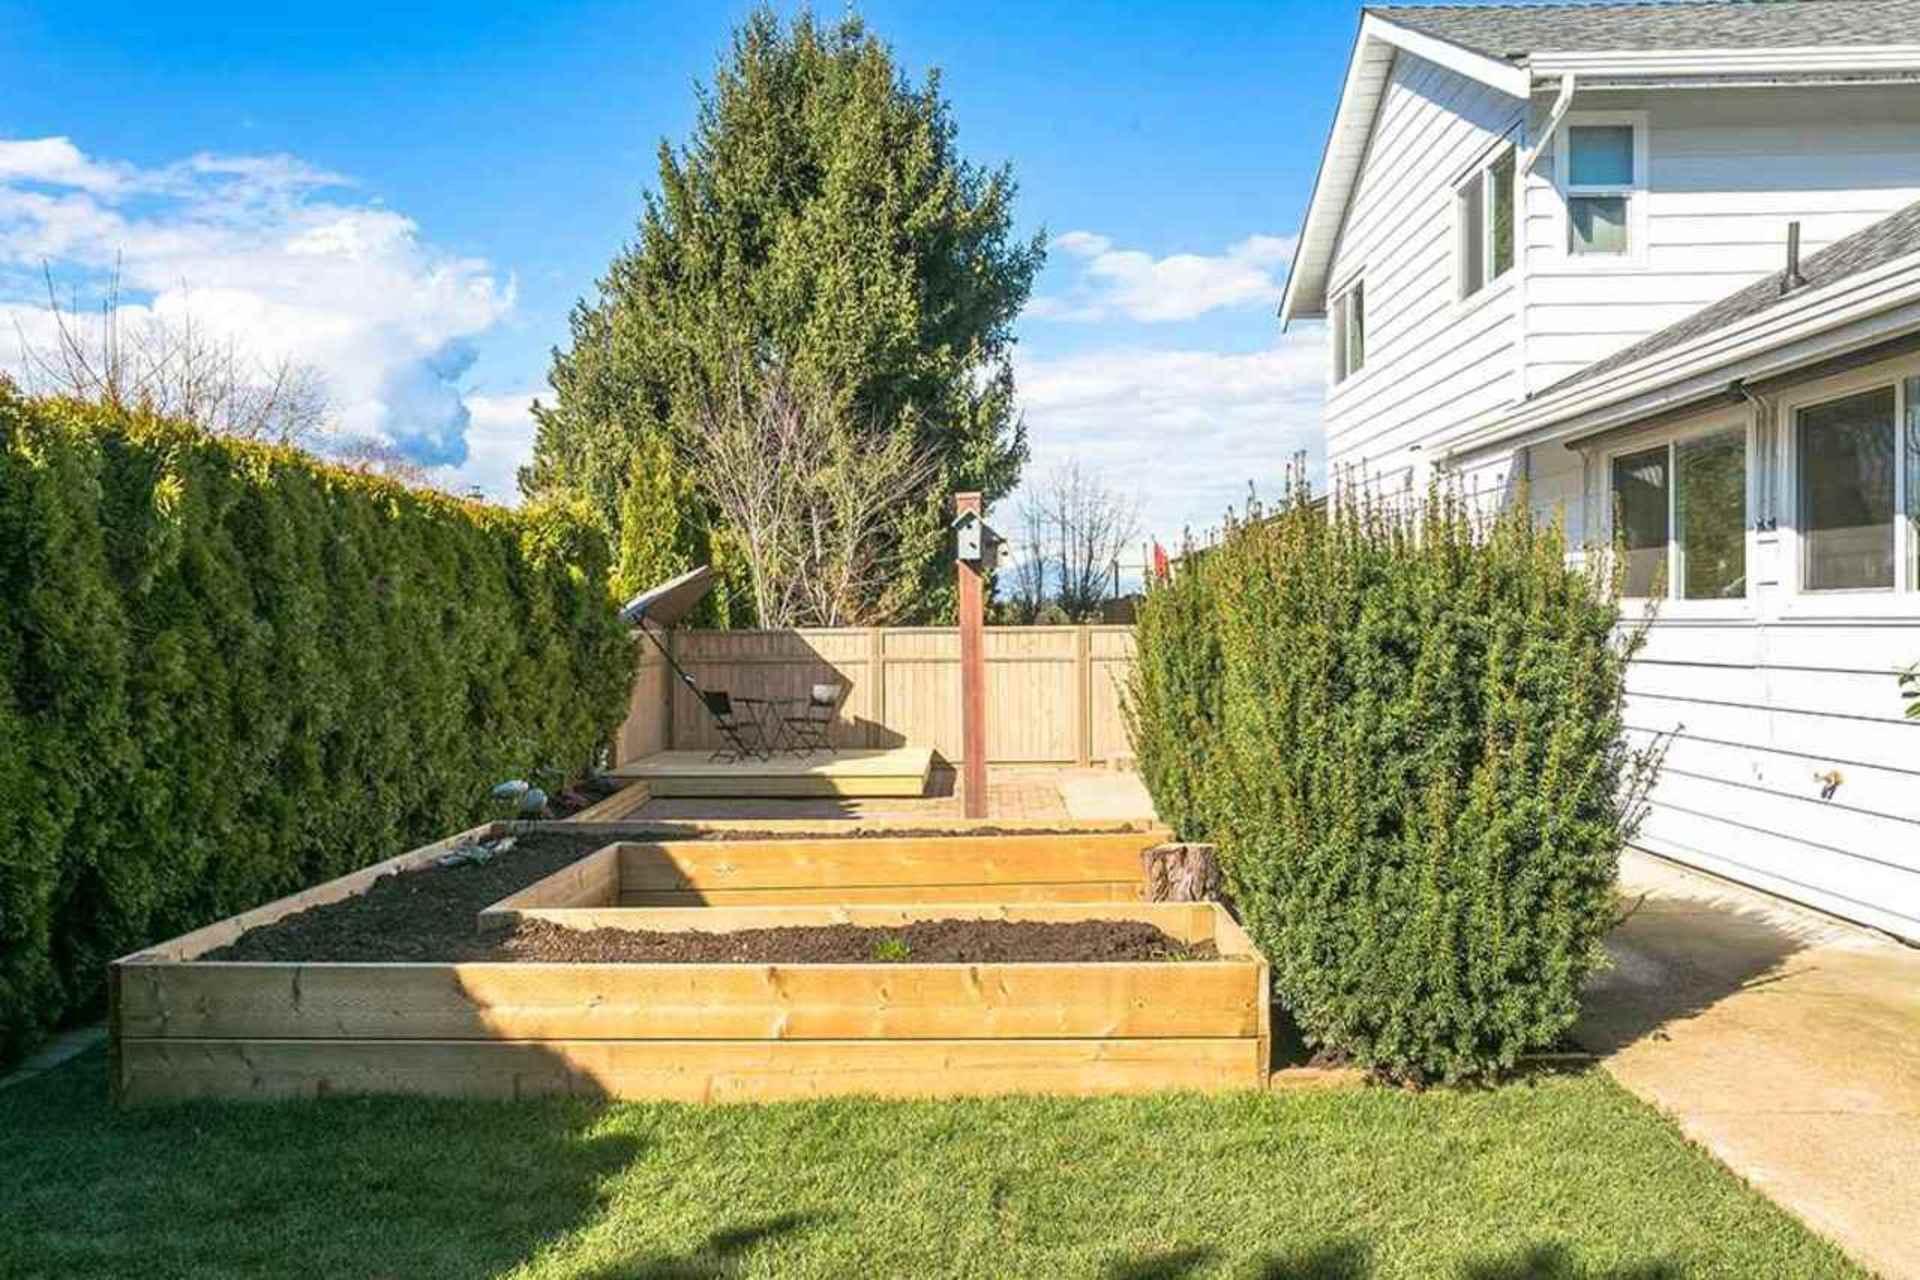 9299-213-street-walnut-grove-langley-18 at 9299 213 Street, Walnut Grove, Langley